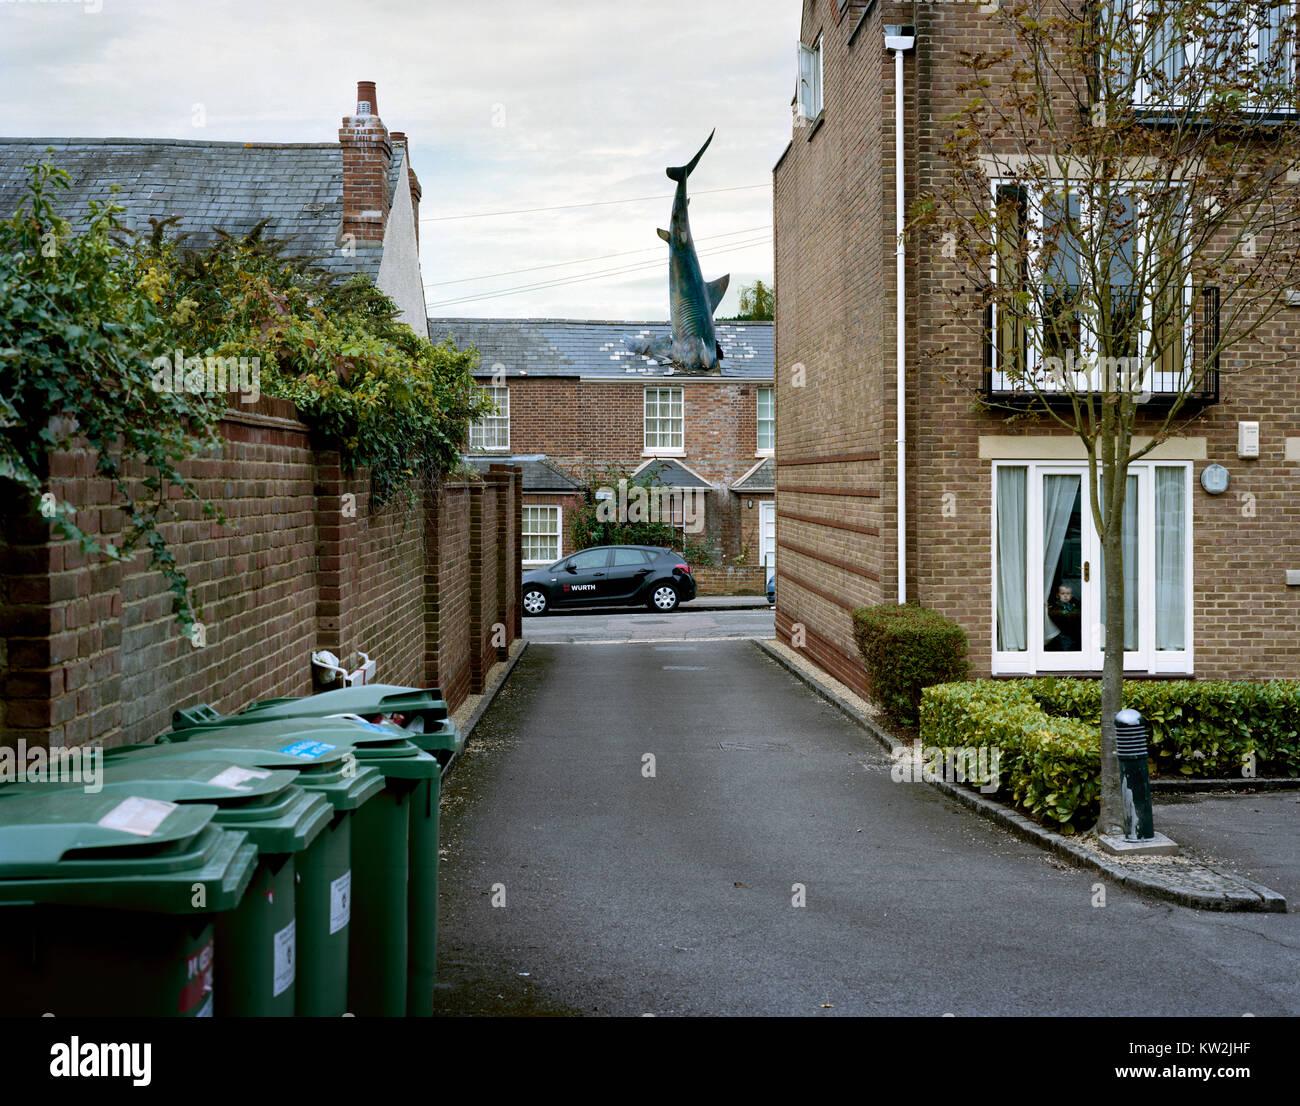 Headington Shark Oxfordshire High Street in Headington, East Oxford, UK. - Stock Image